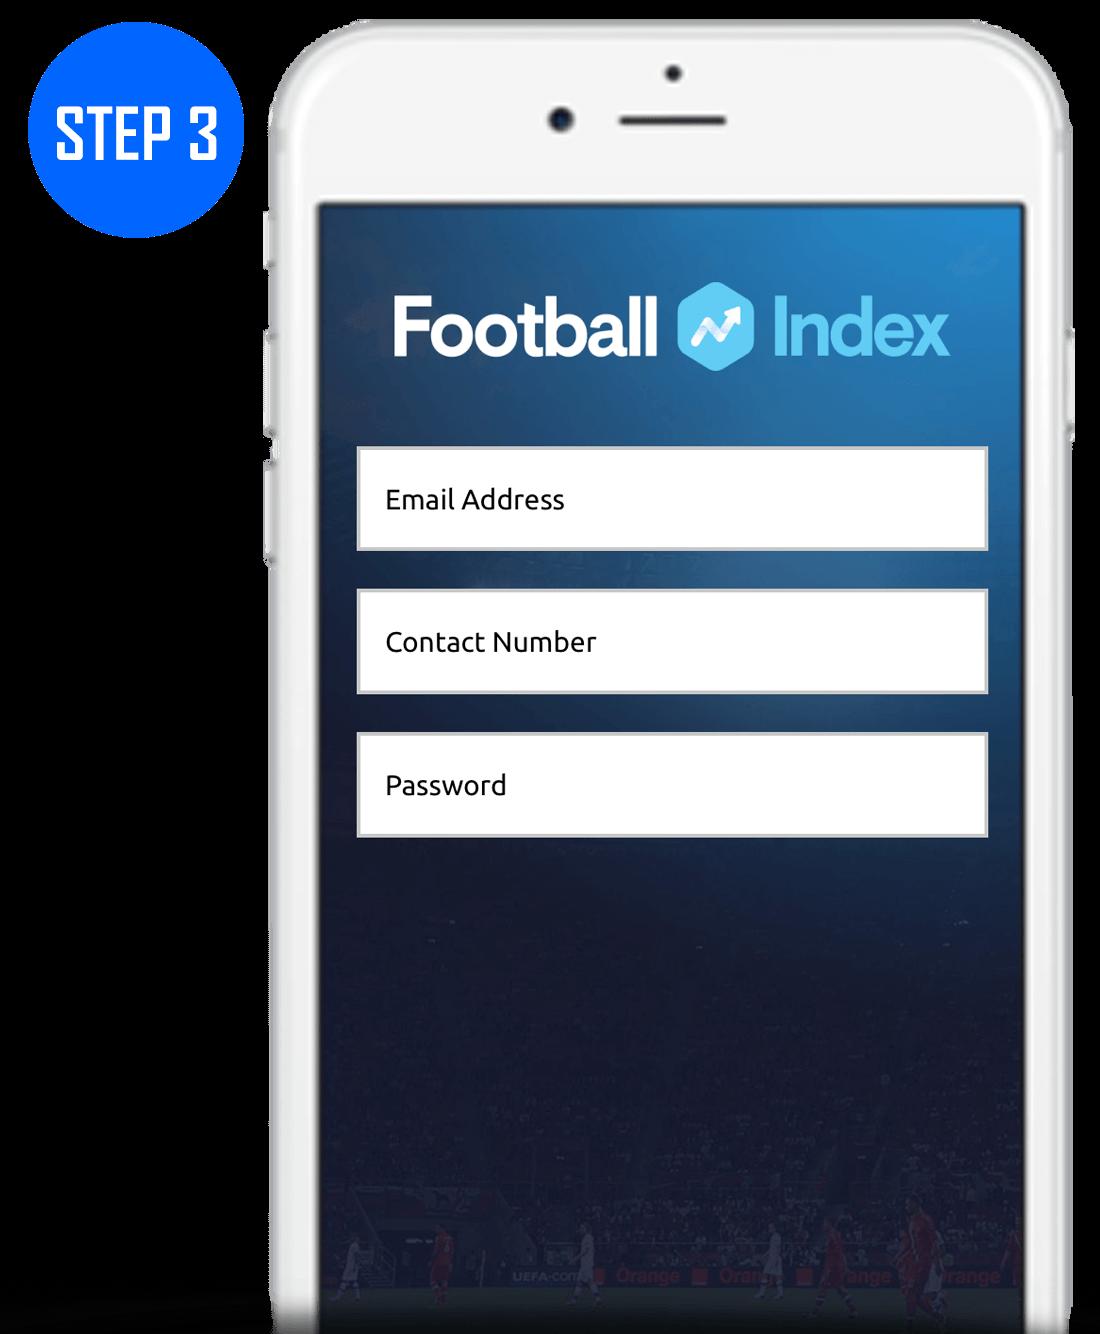 Football Index Sign Up Process Step 3